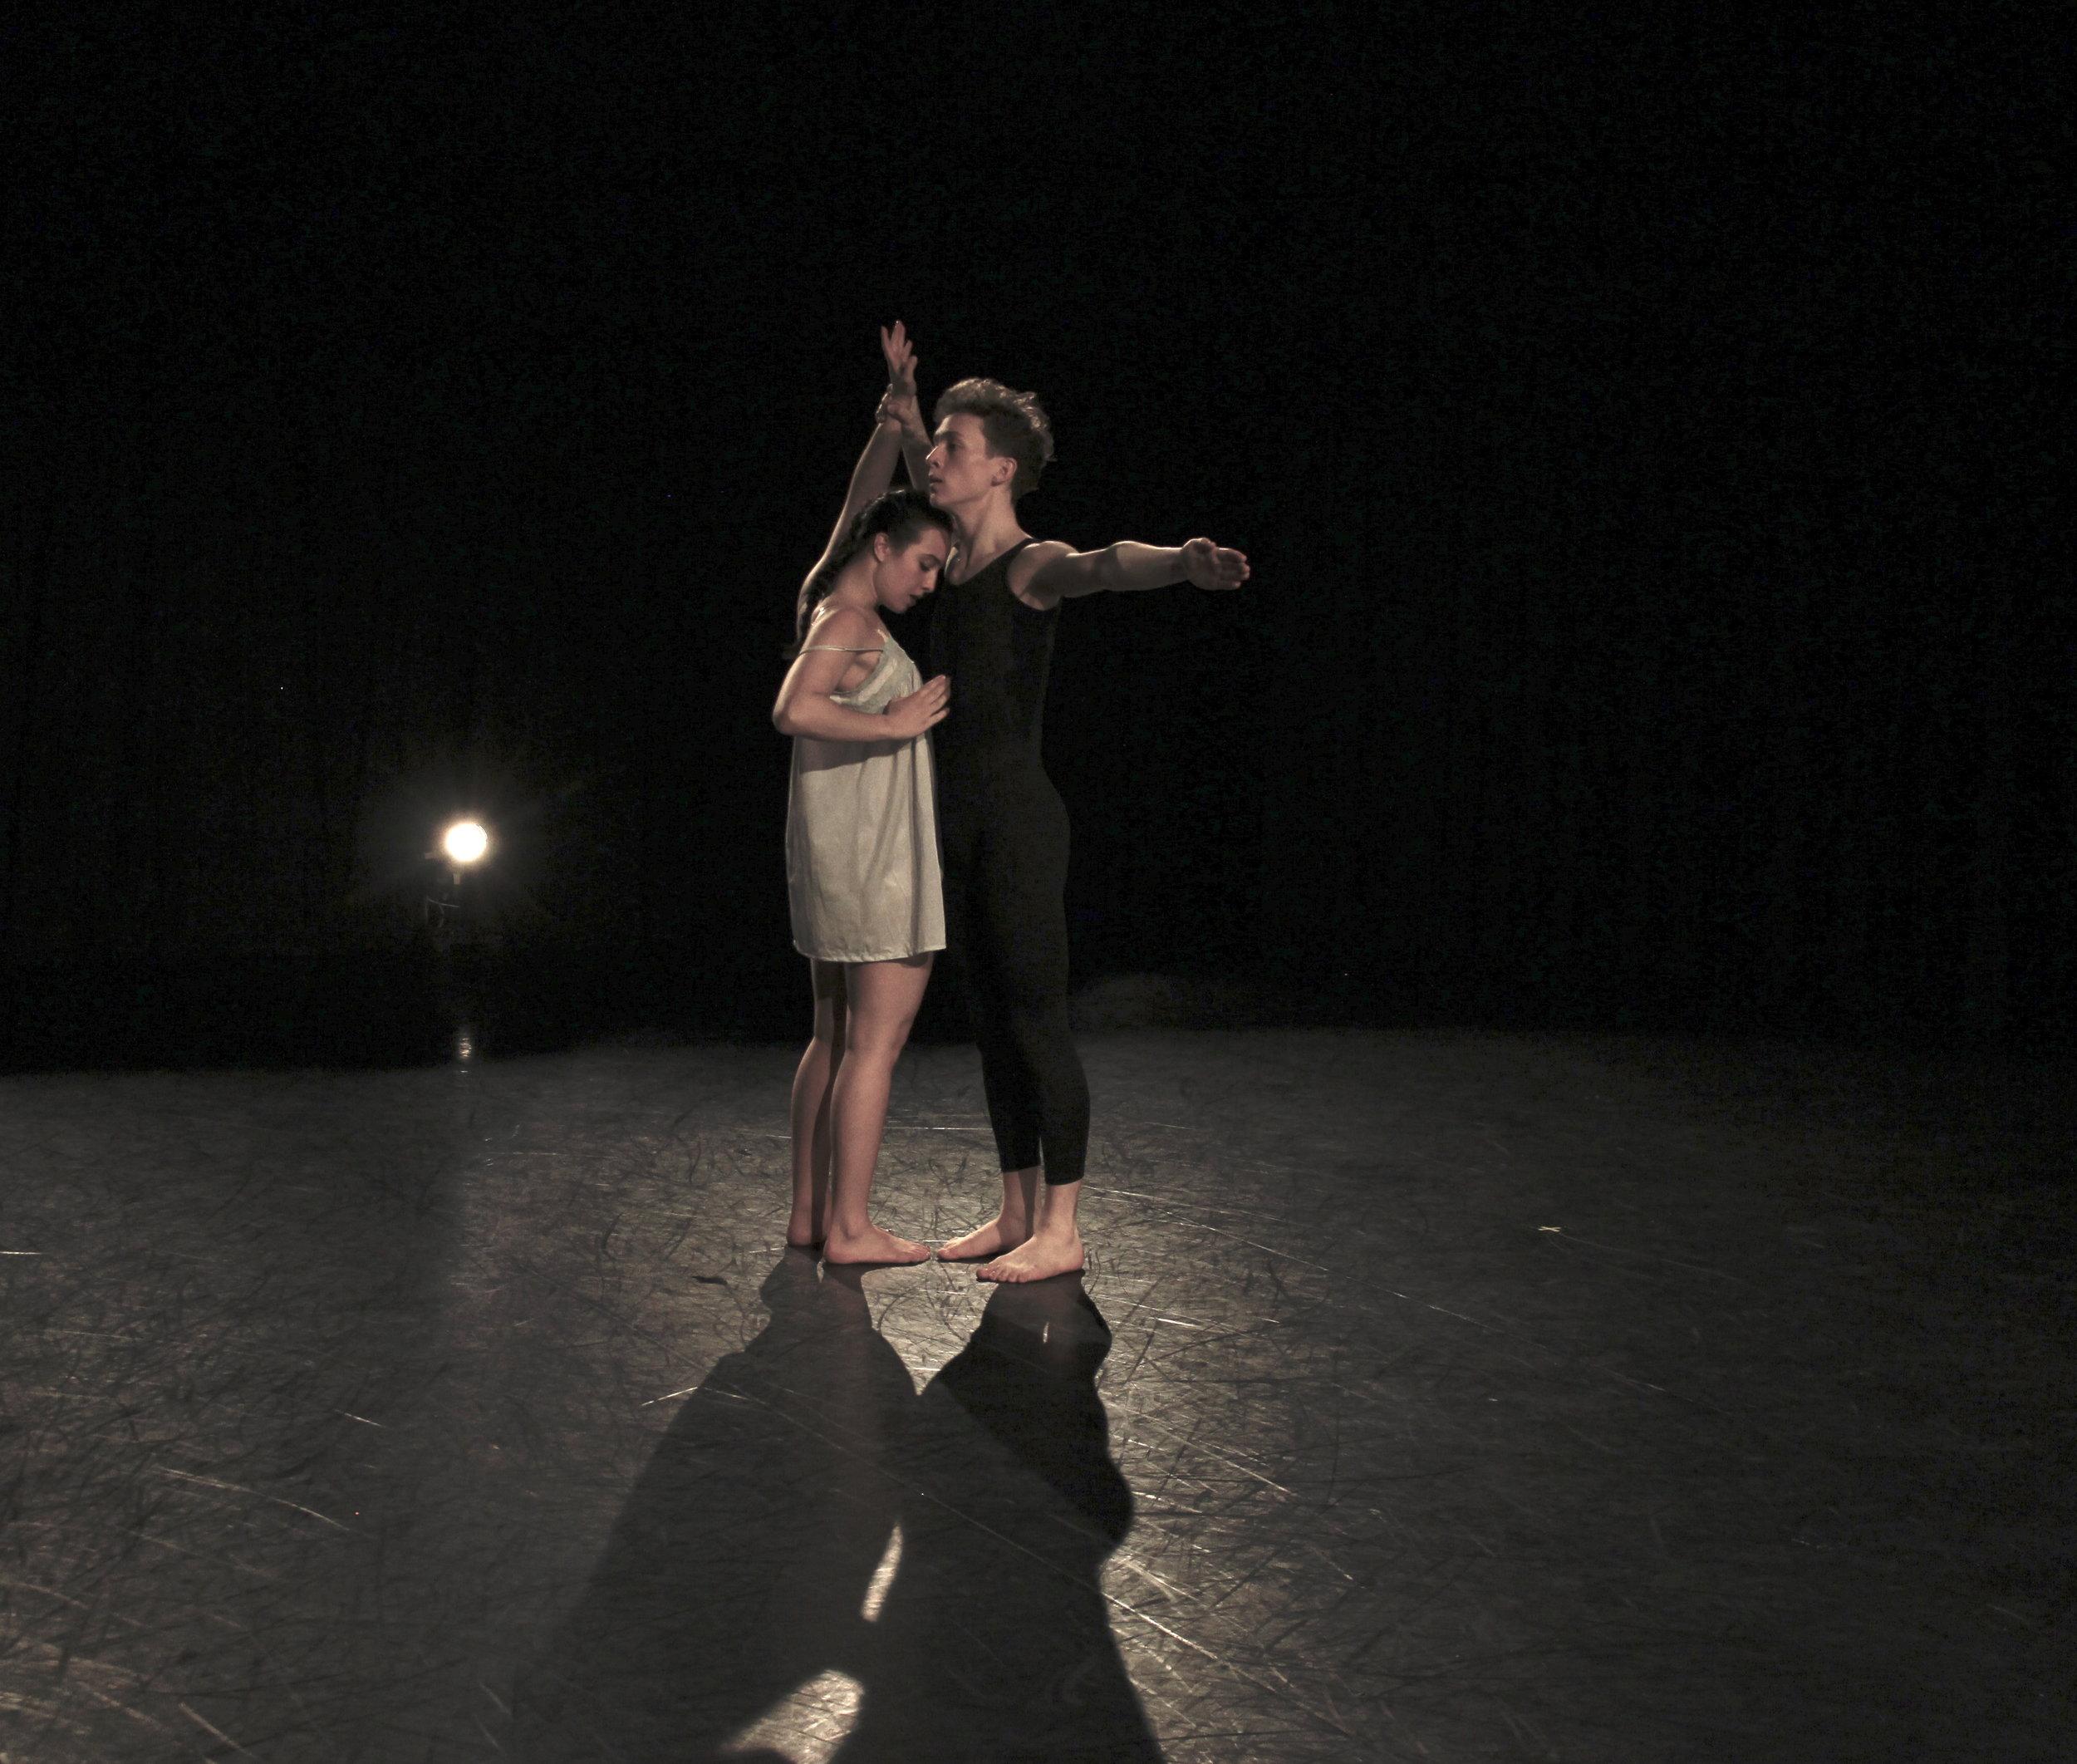 Dancers: Evan Webb, Rachel Facchini